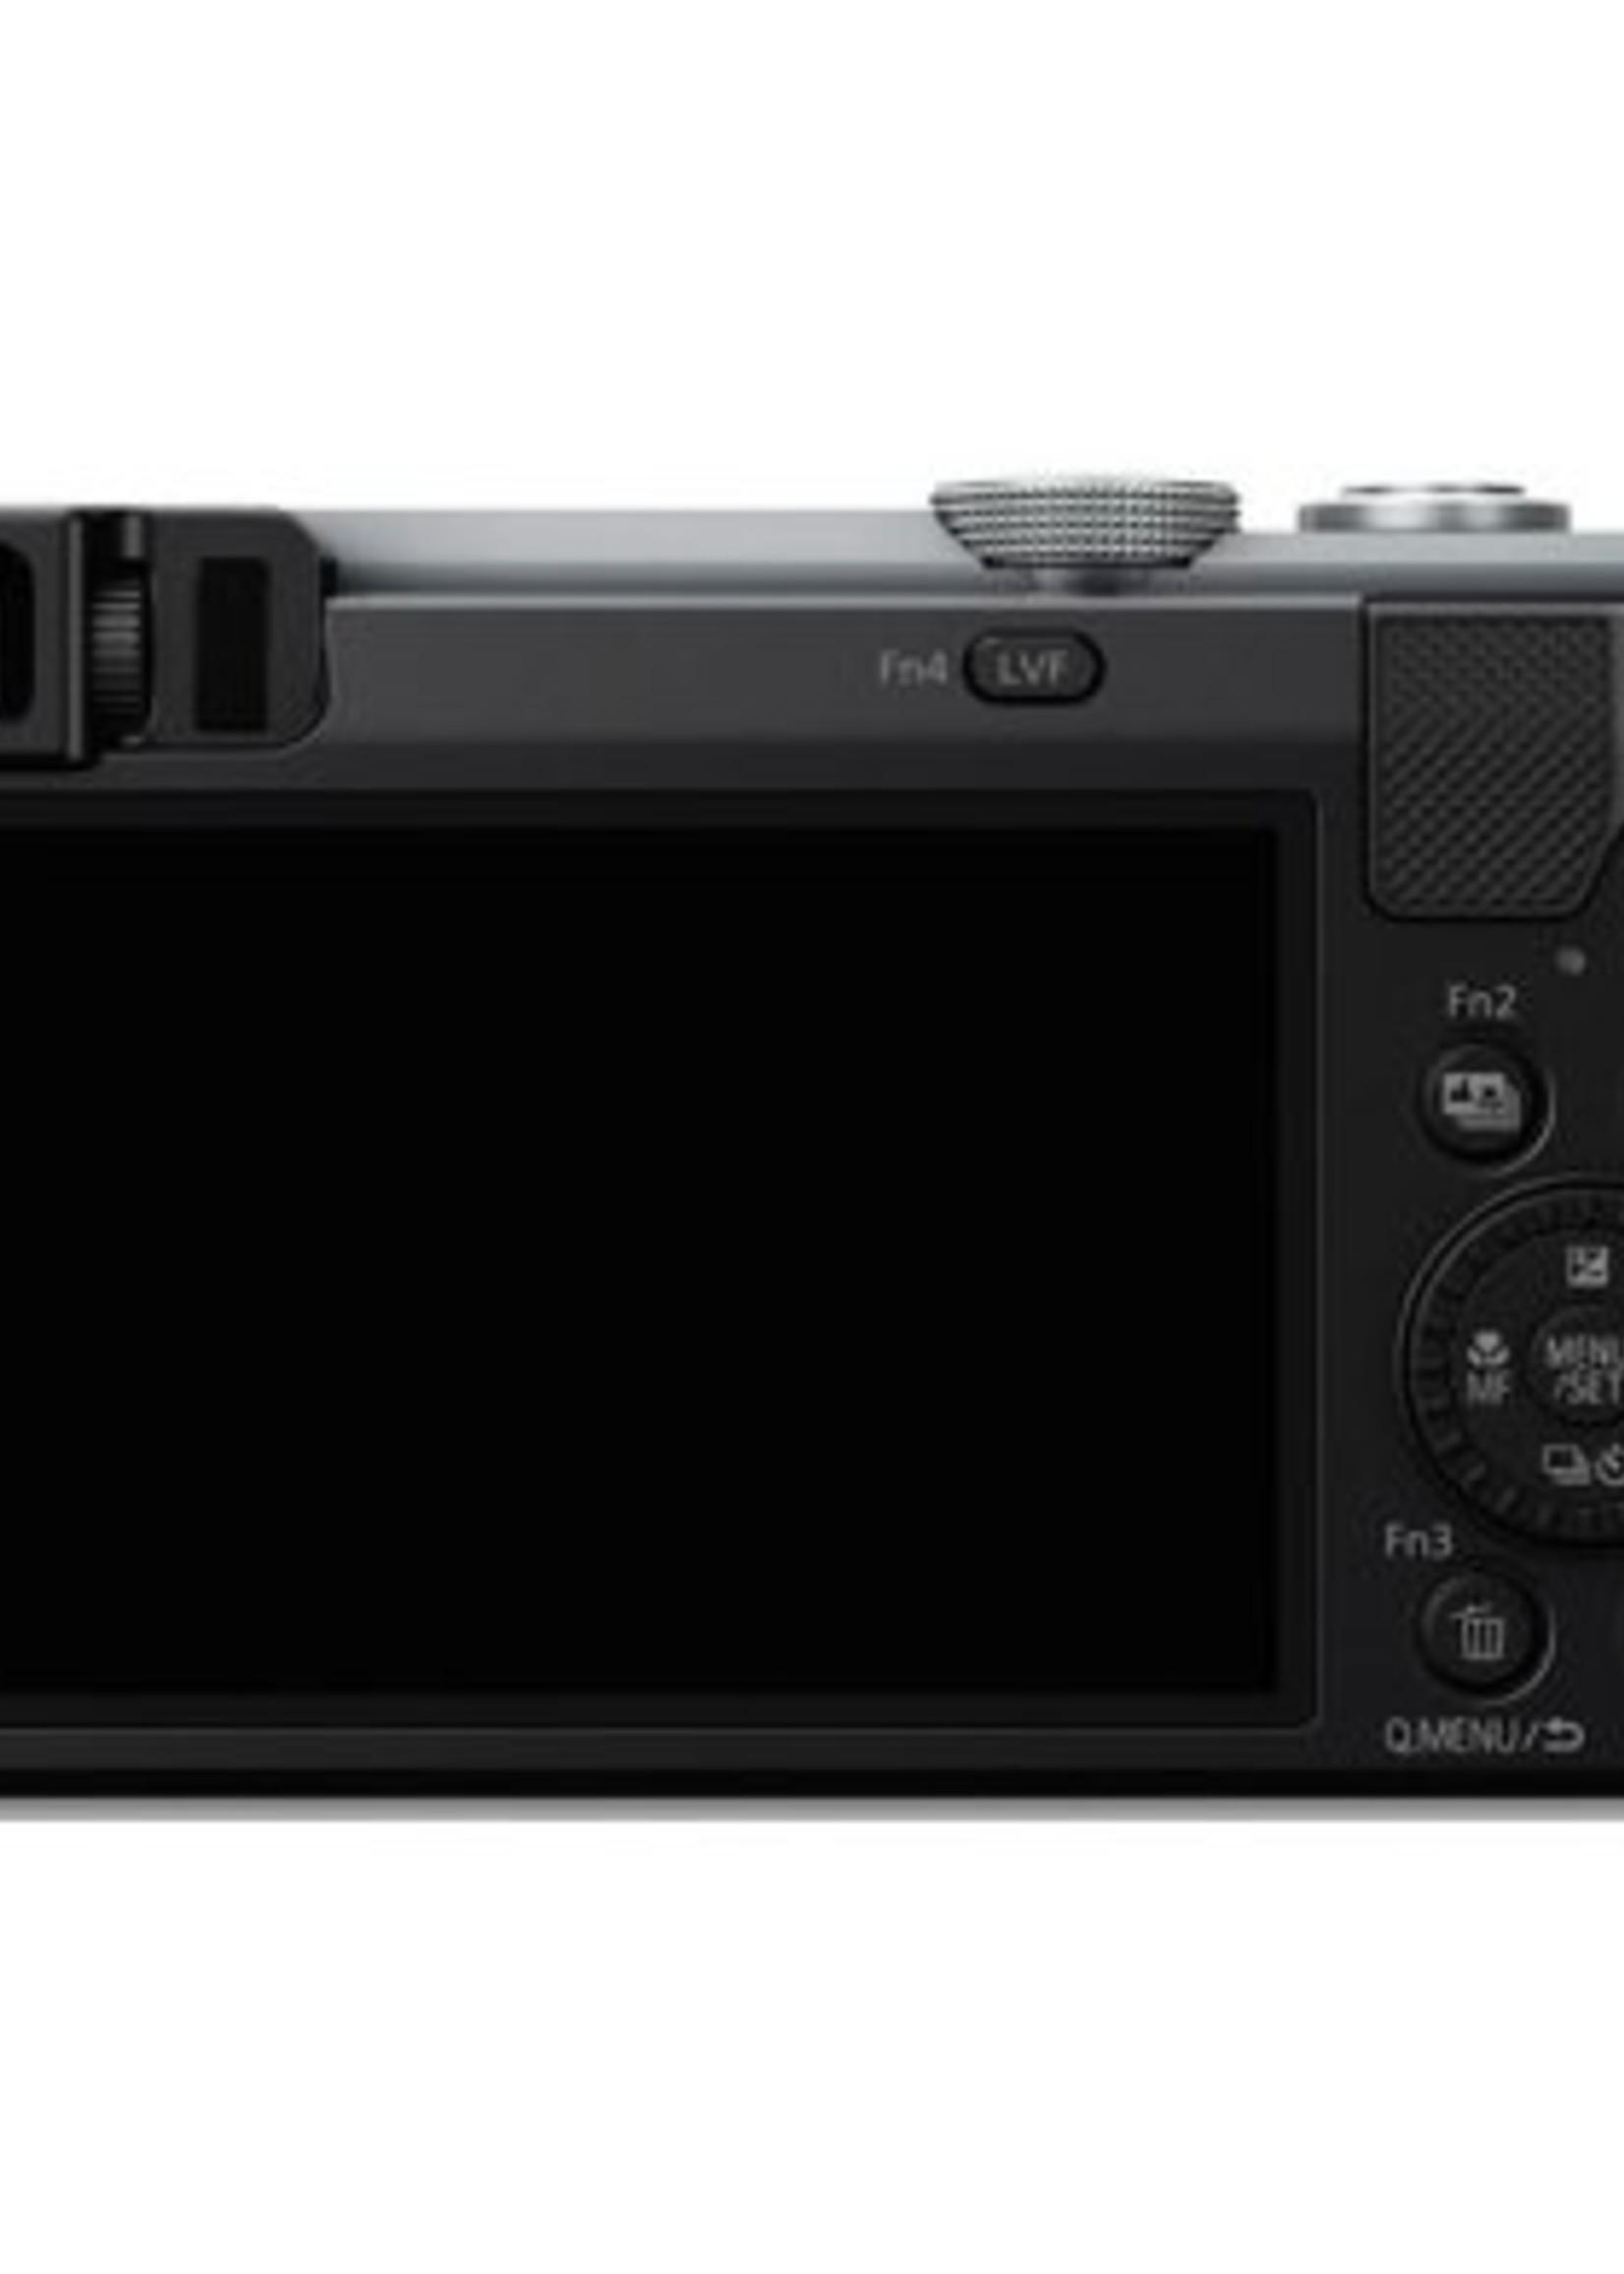 Panasonic Panasonic DMC-ZS60 Black and Silver